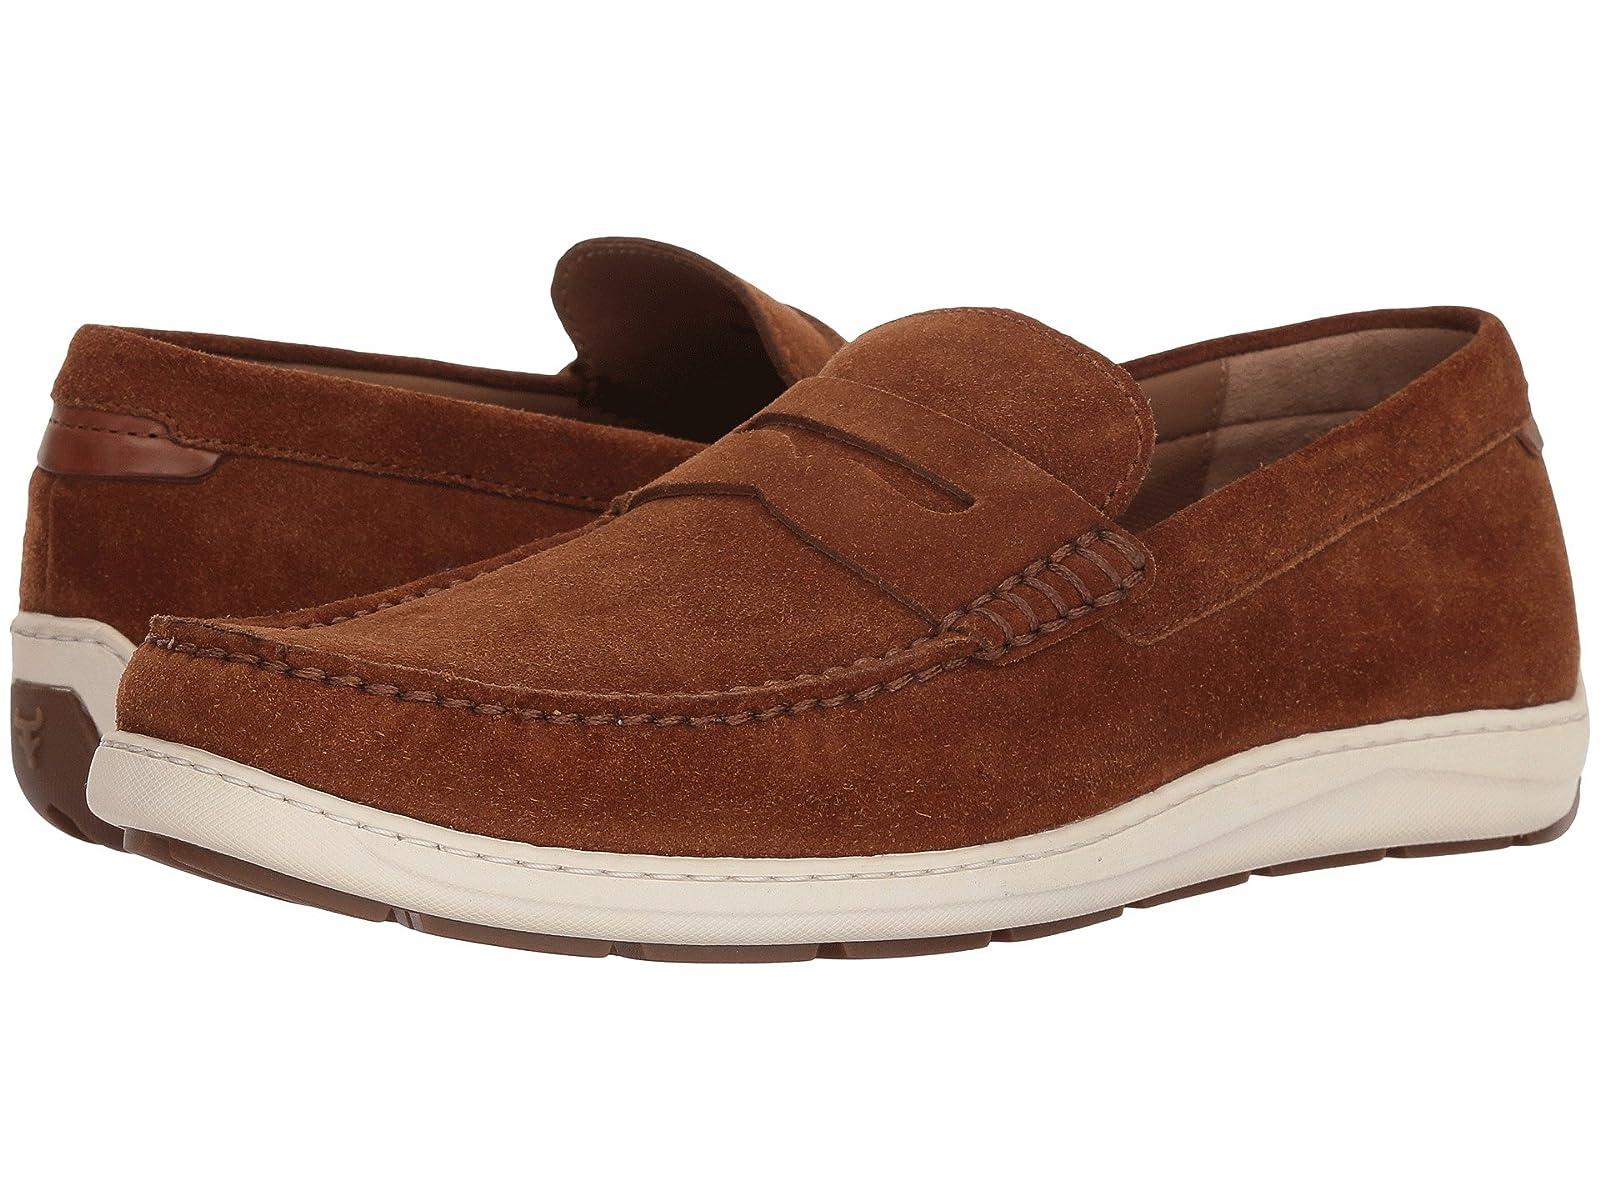 Trask SheldonAtmospheric grades have affordable shoes